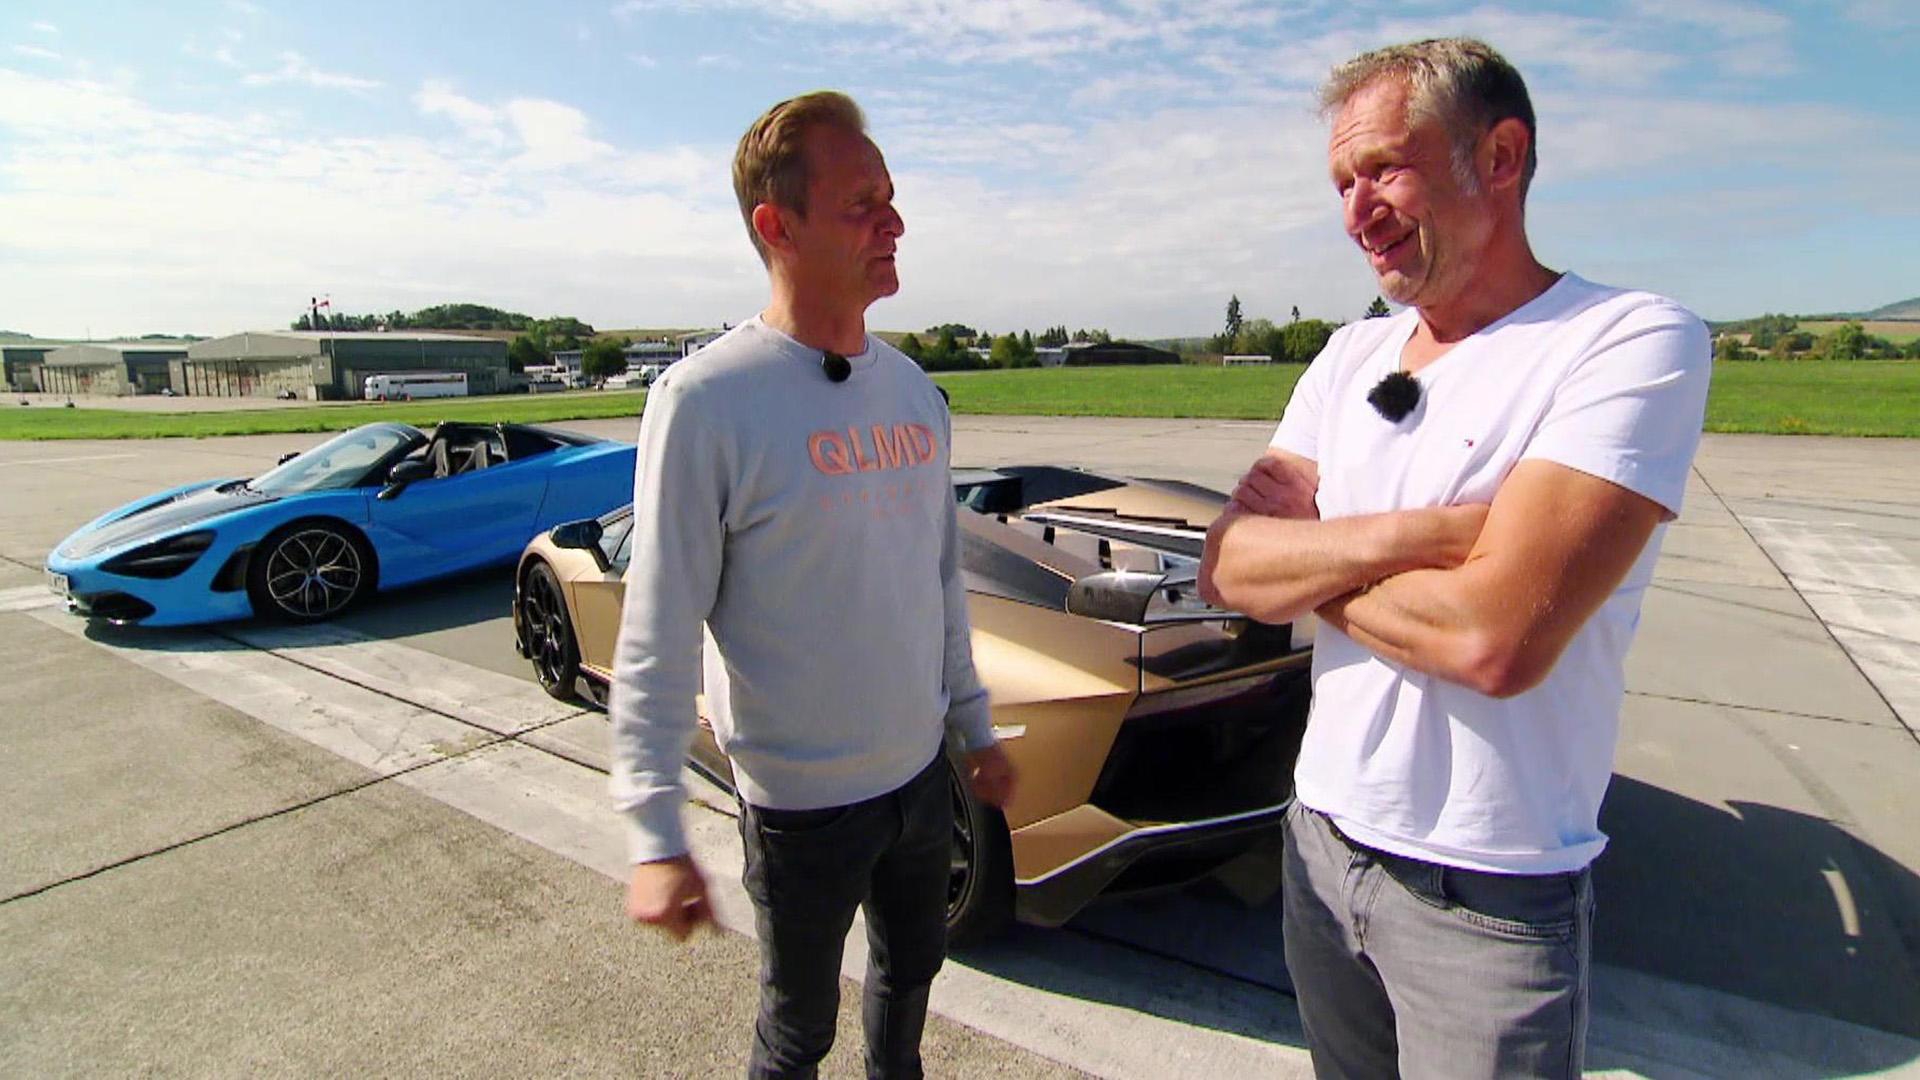 Hypersport-Cabrios - Lamborghini Aventador SVJ vs. McLaren 720S  | Folge 527